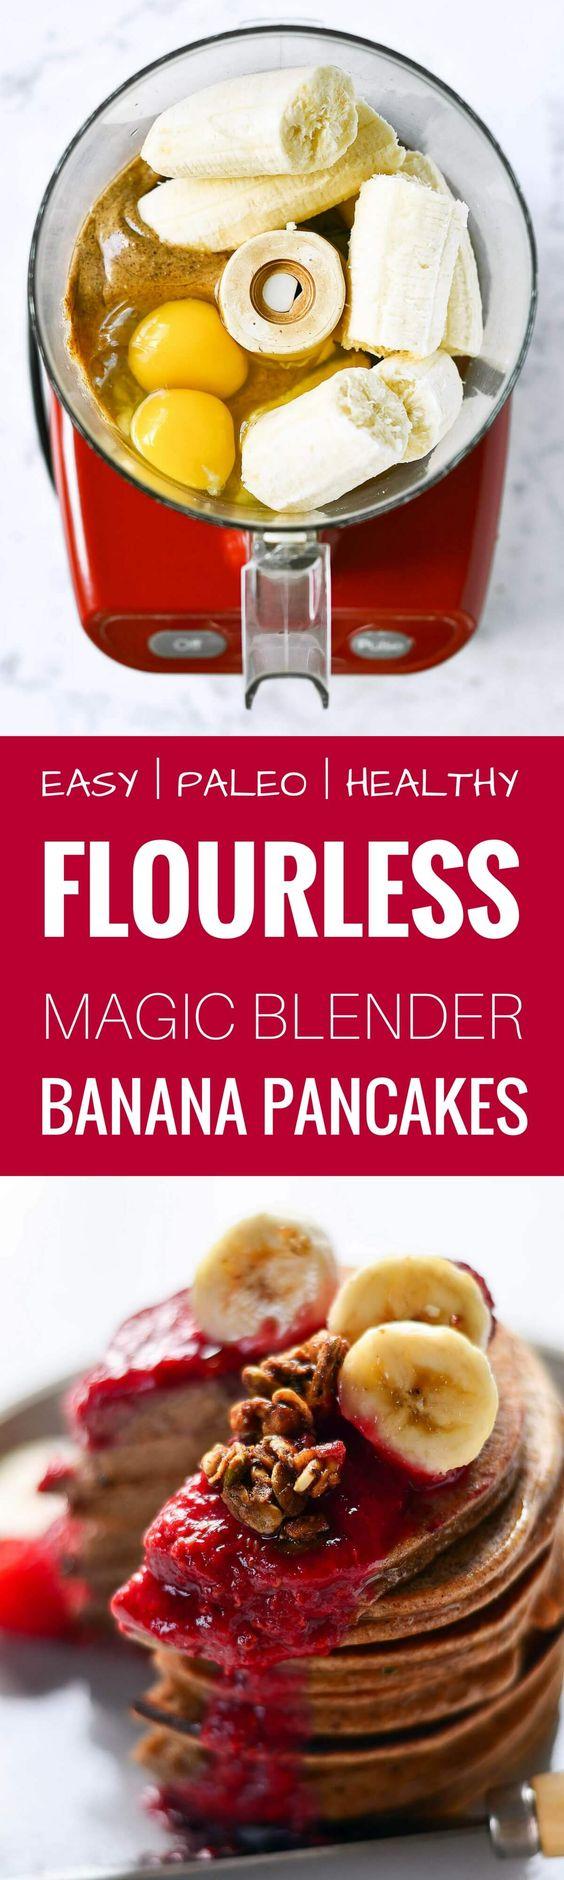 Magic paleo blender banana pancakes. best paleo pancakes recipe. Light, soft, and fluffy! 3 ingredients. Easy paleo pancake recipe. Best healthy banana pancakes recipe. Flourless banana pancakes. Pancakes from scratch. Pancakes ideas. Healthy fluffy banana pancakes. Paleo almond pancakes.